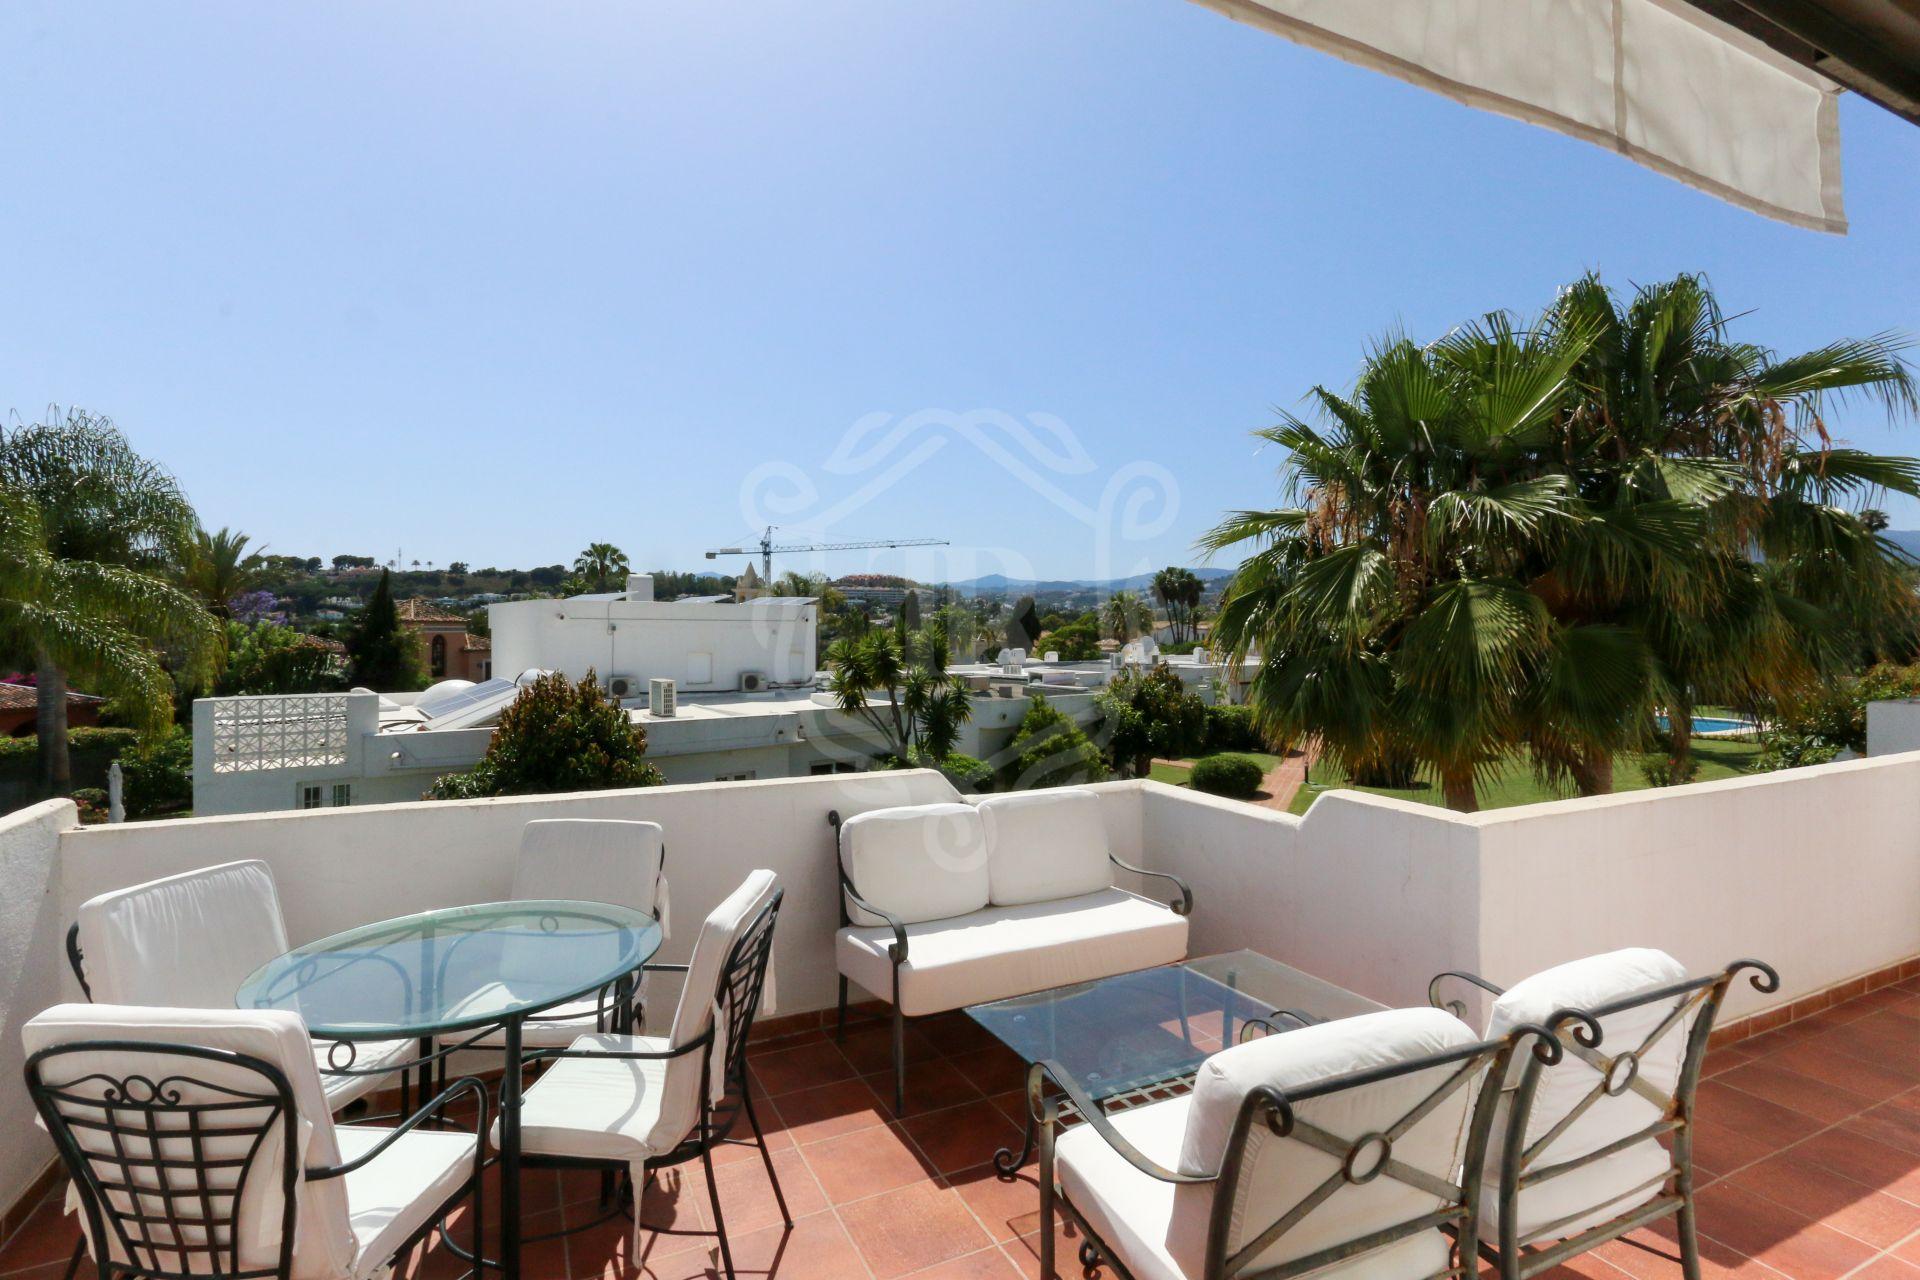 Penthouse for sale in Aloha Sur 32, Nueva Andalucia